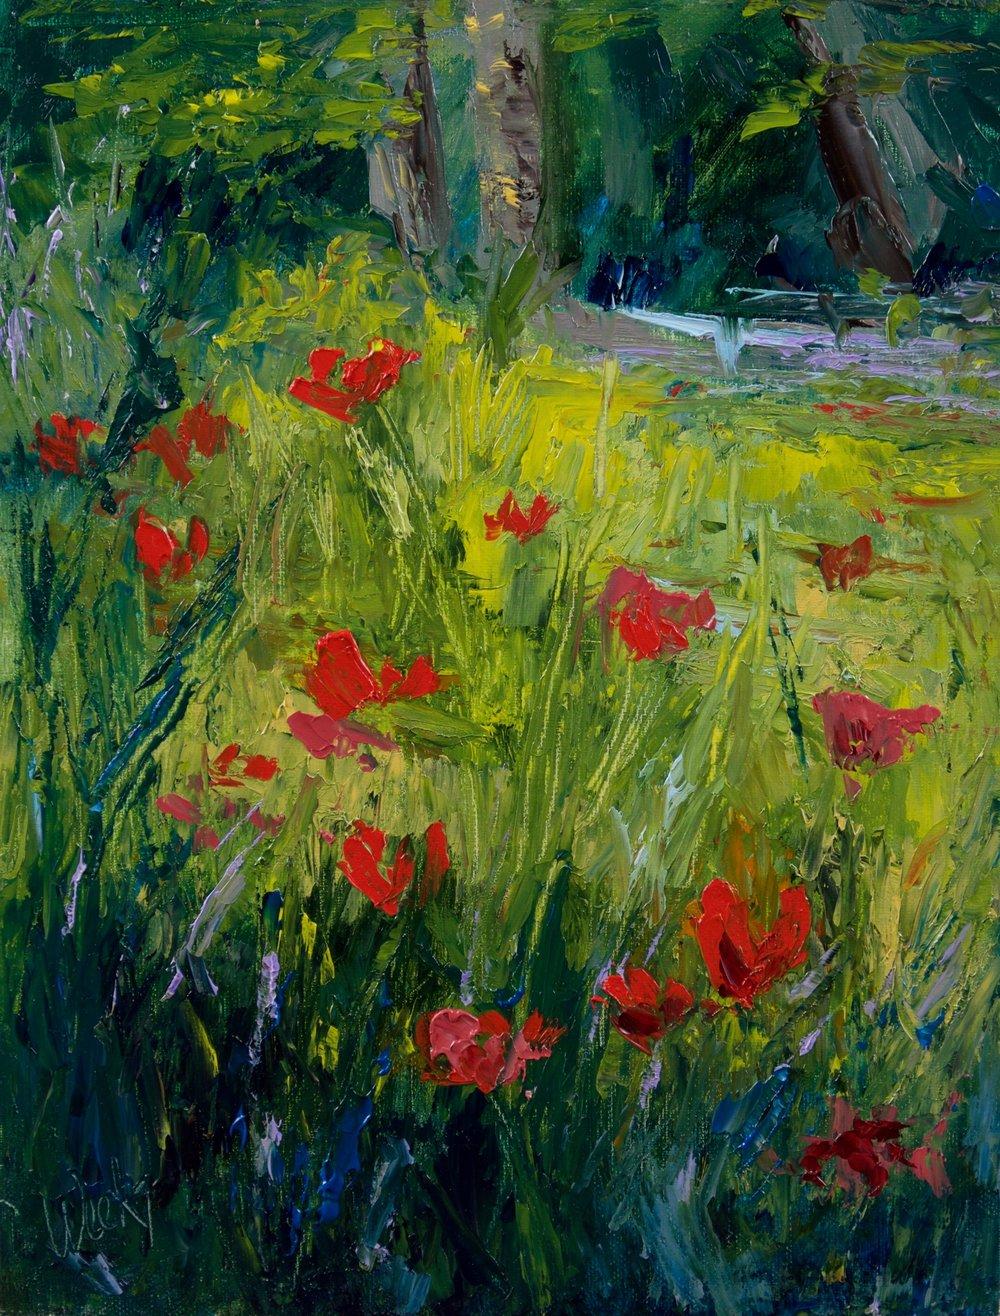 """Woodland Beauty"" - 12 x 9 inch"